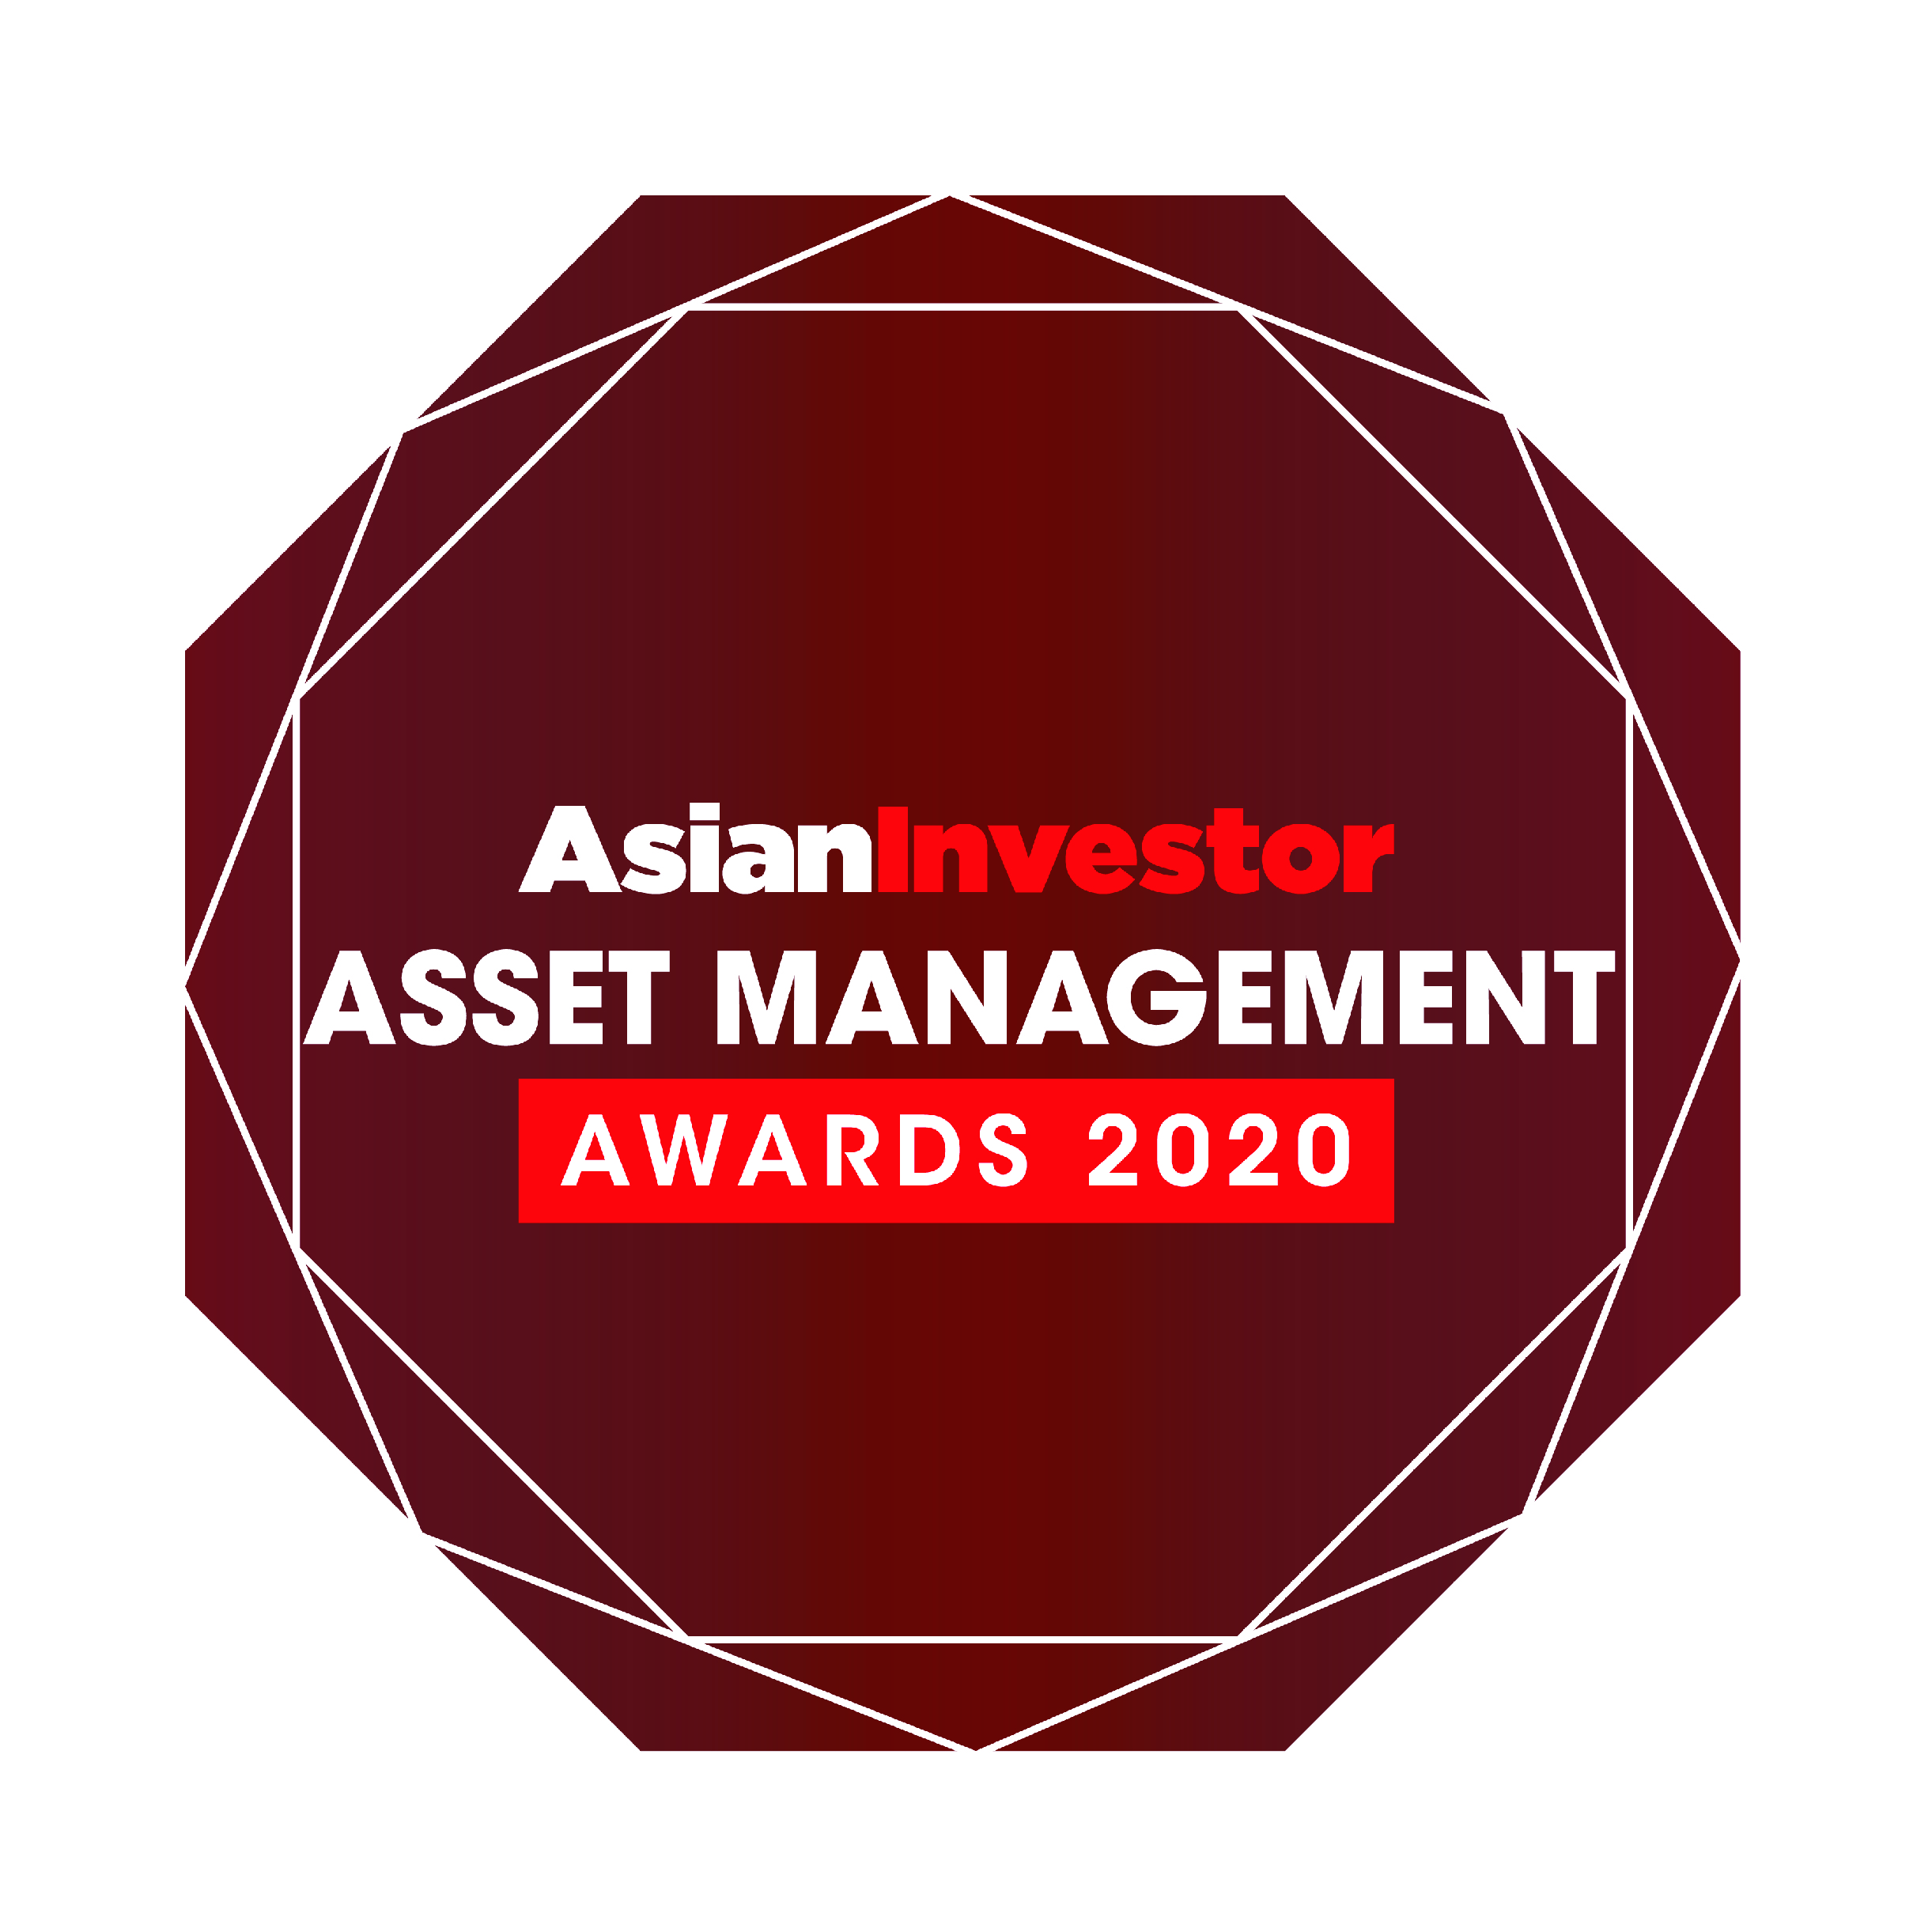 AsianInvestor Asset Management Awards 2020